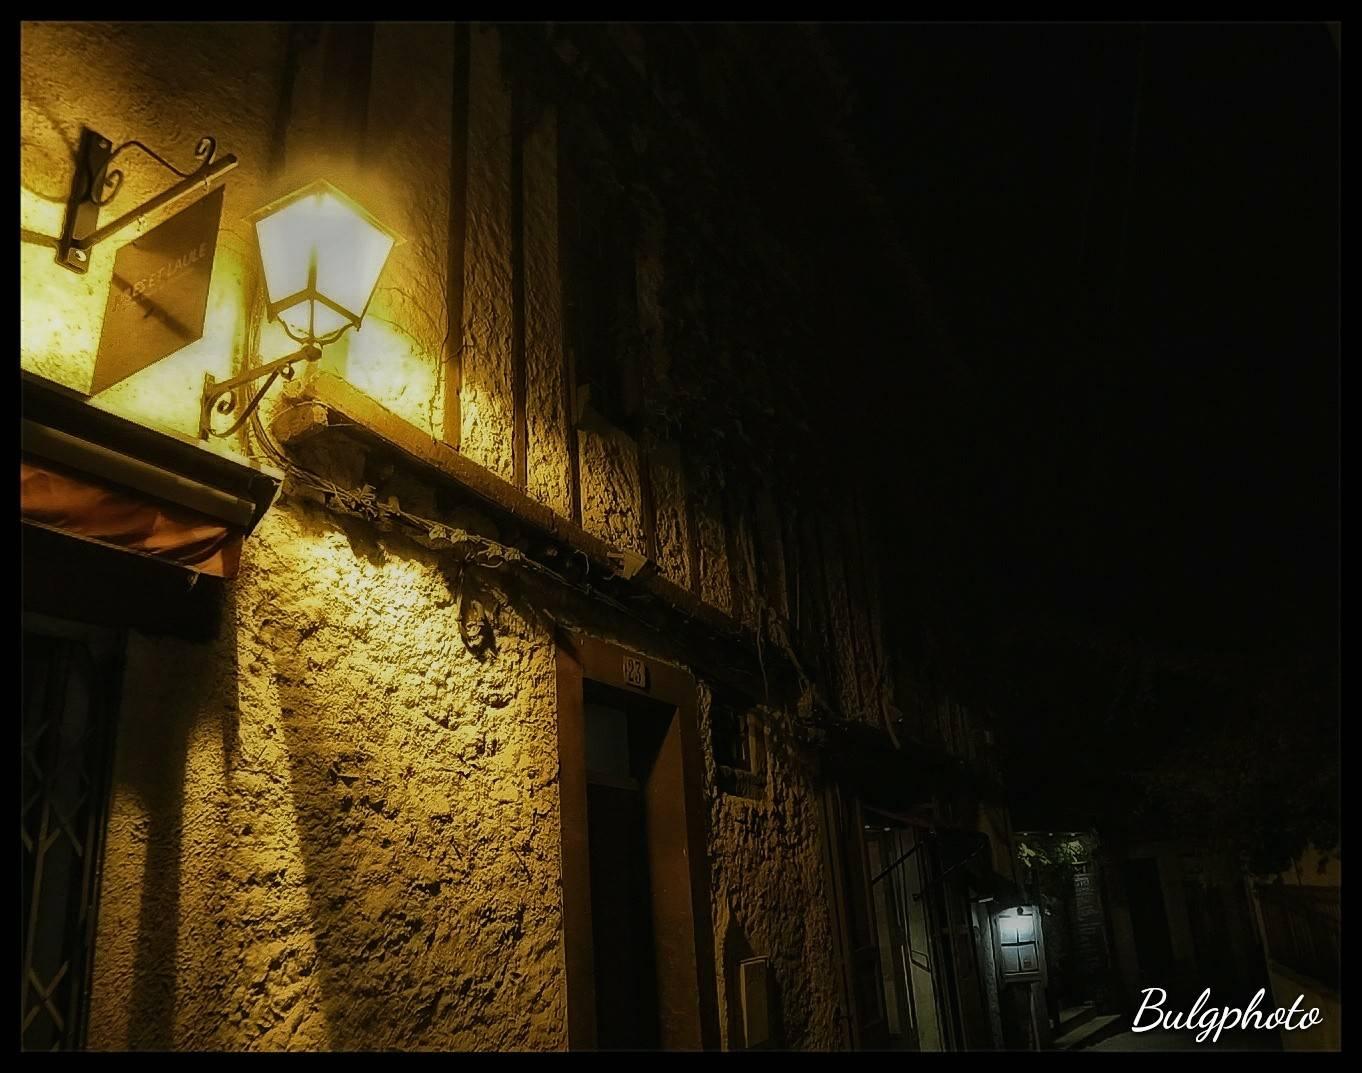 Carcassonne 2, France by bulgphoto